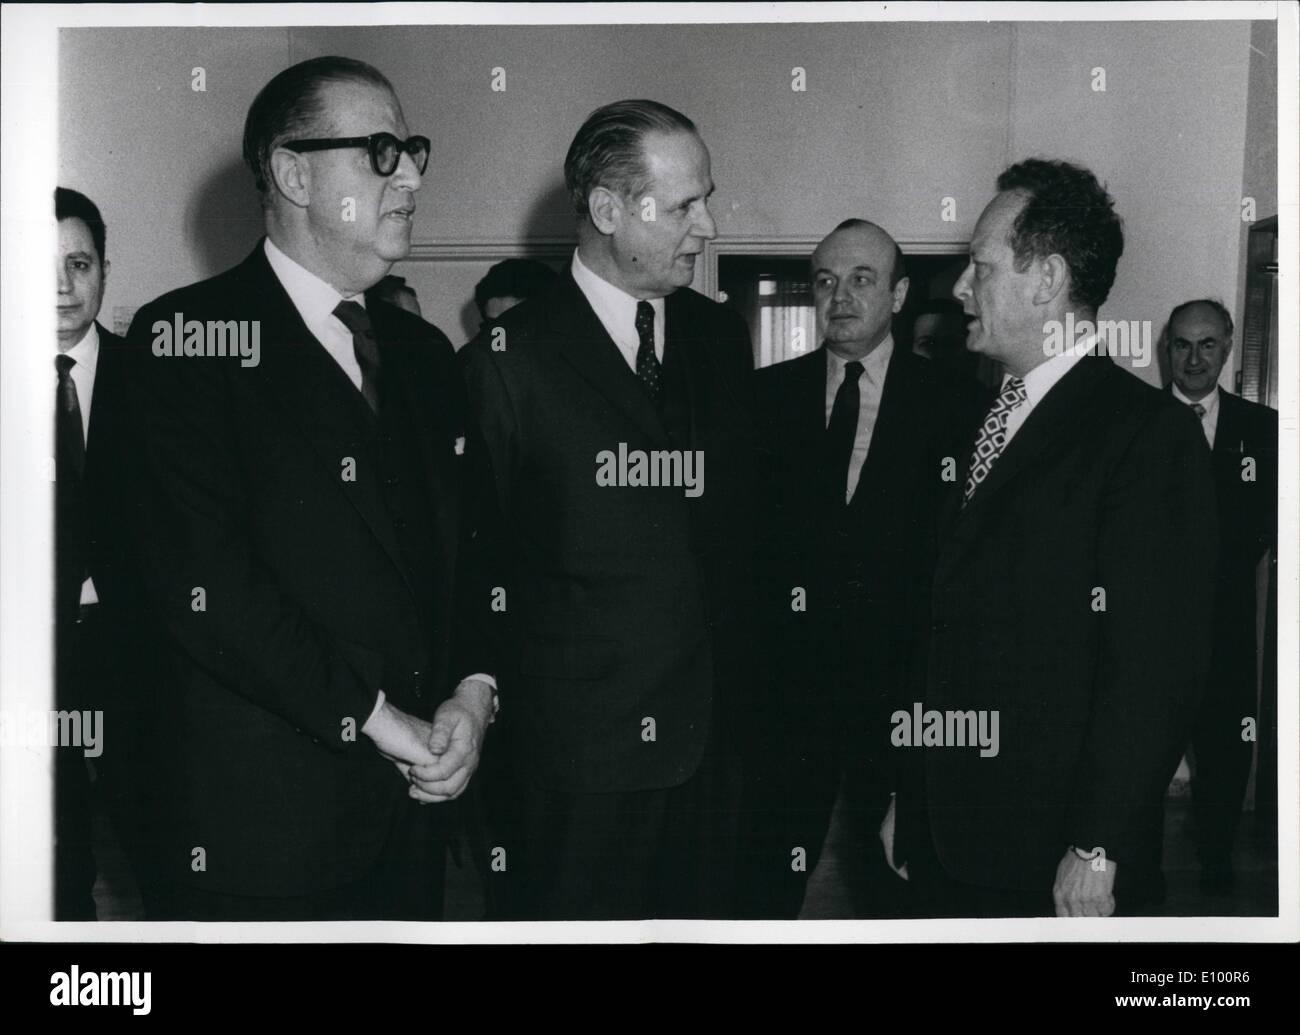 Feb. 02, 1972 - A. Evan + Dr. Yarring + Tekoa + Alon + Tervsal - Stock Image